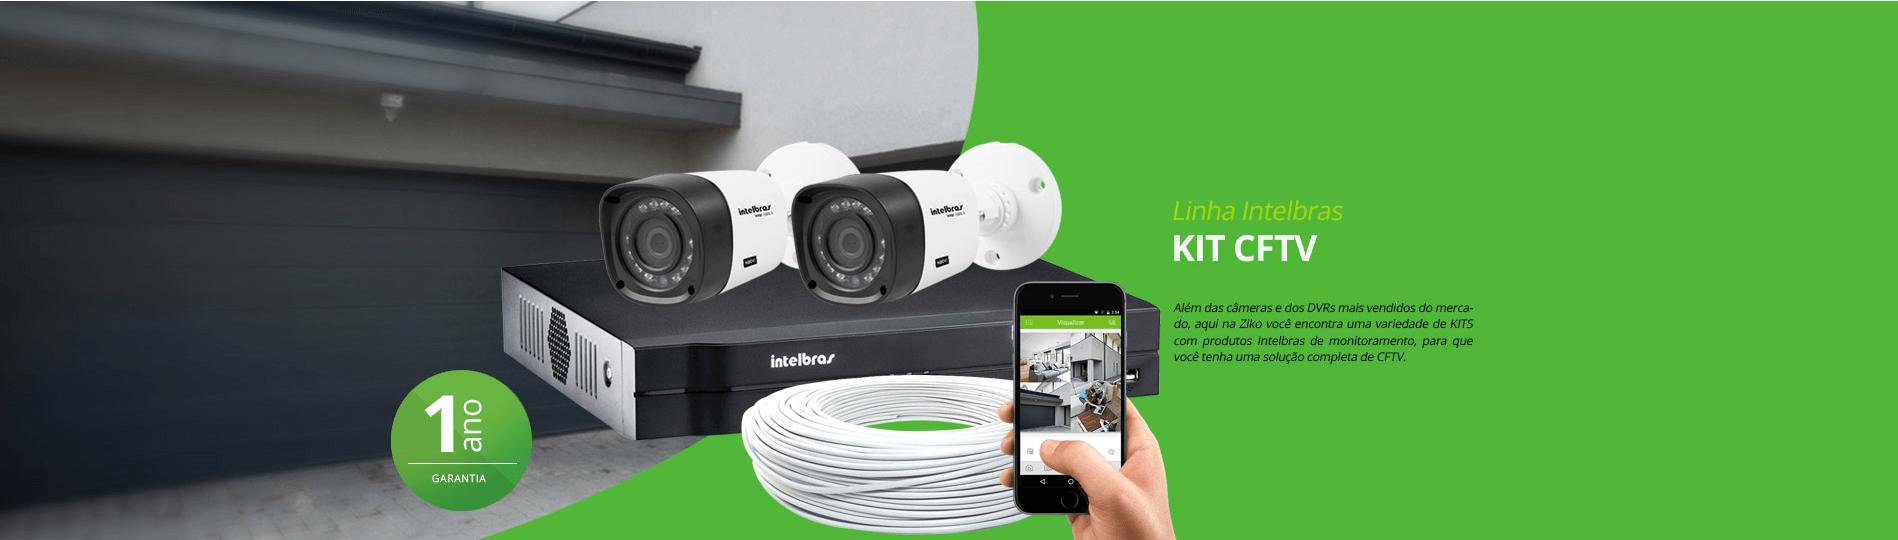 Linha Intelbras kit CFTV